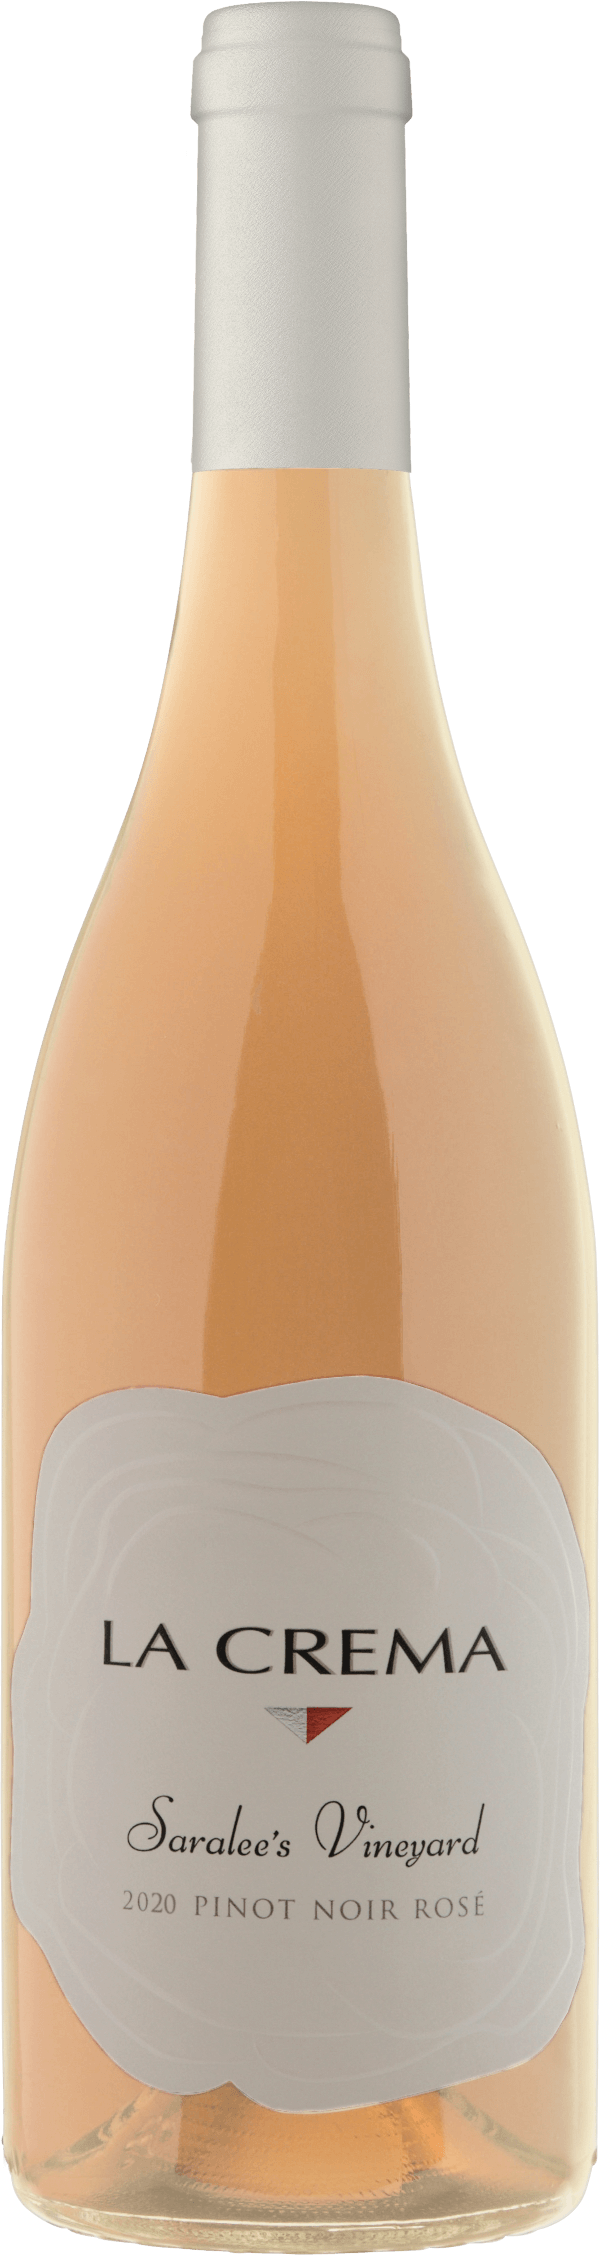 2020 Saralee's Vineyard Pinot Noir Rosé